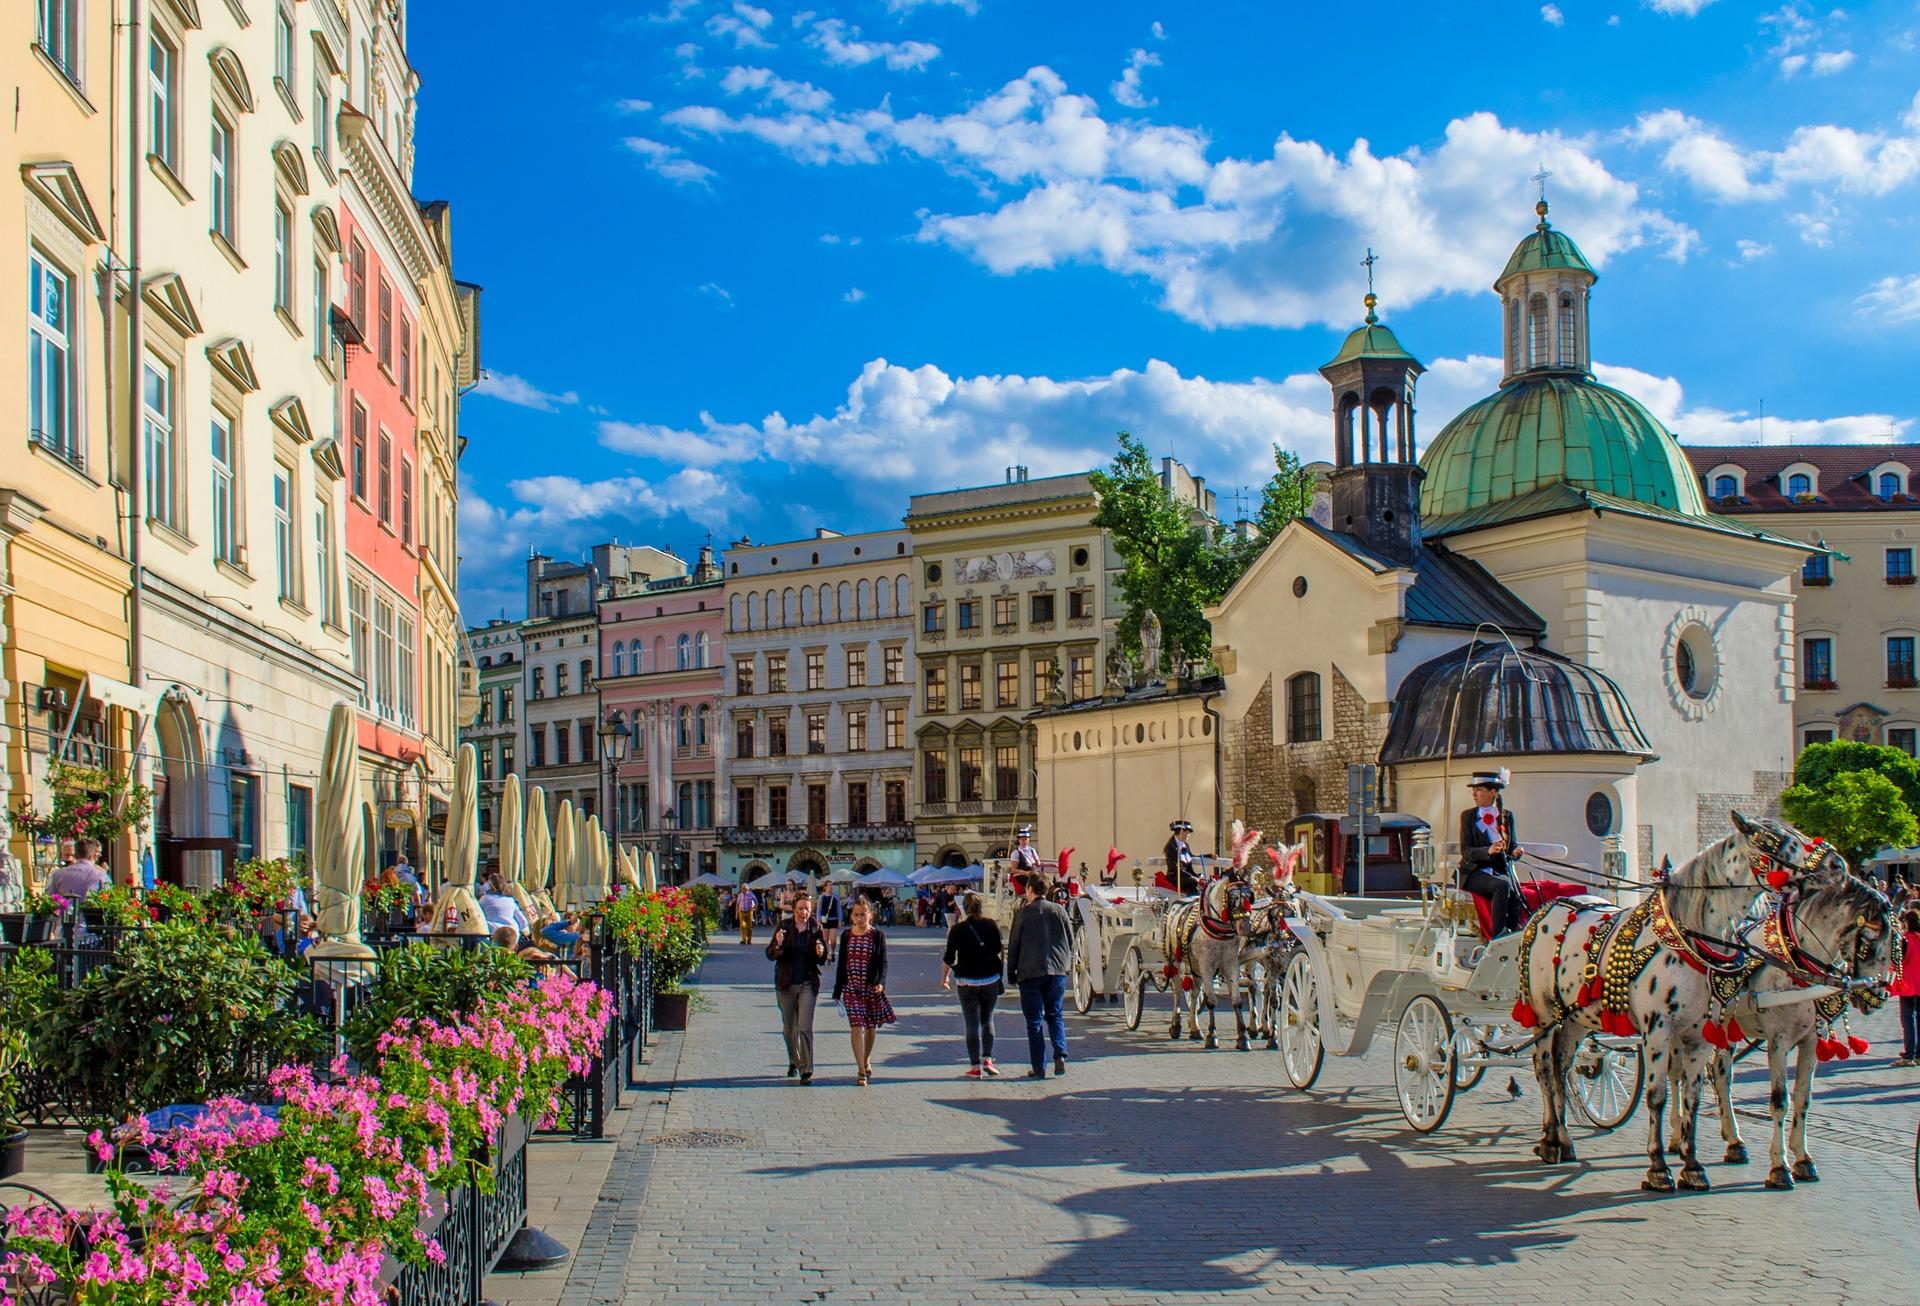 Krakow Guide: Exploring Poland's Cultural Capital